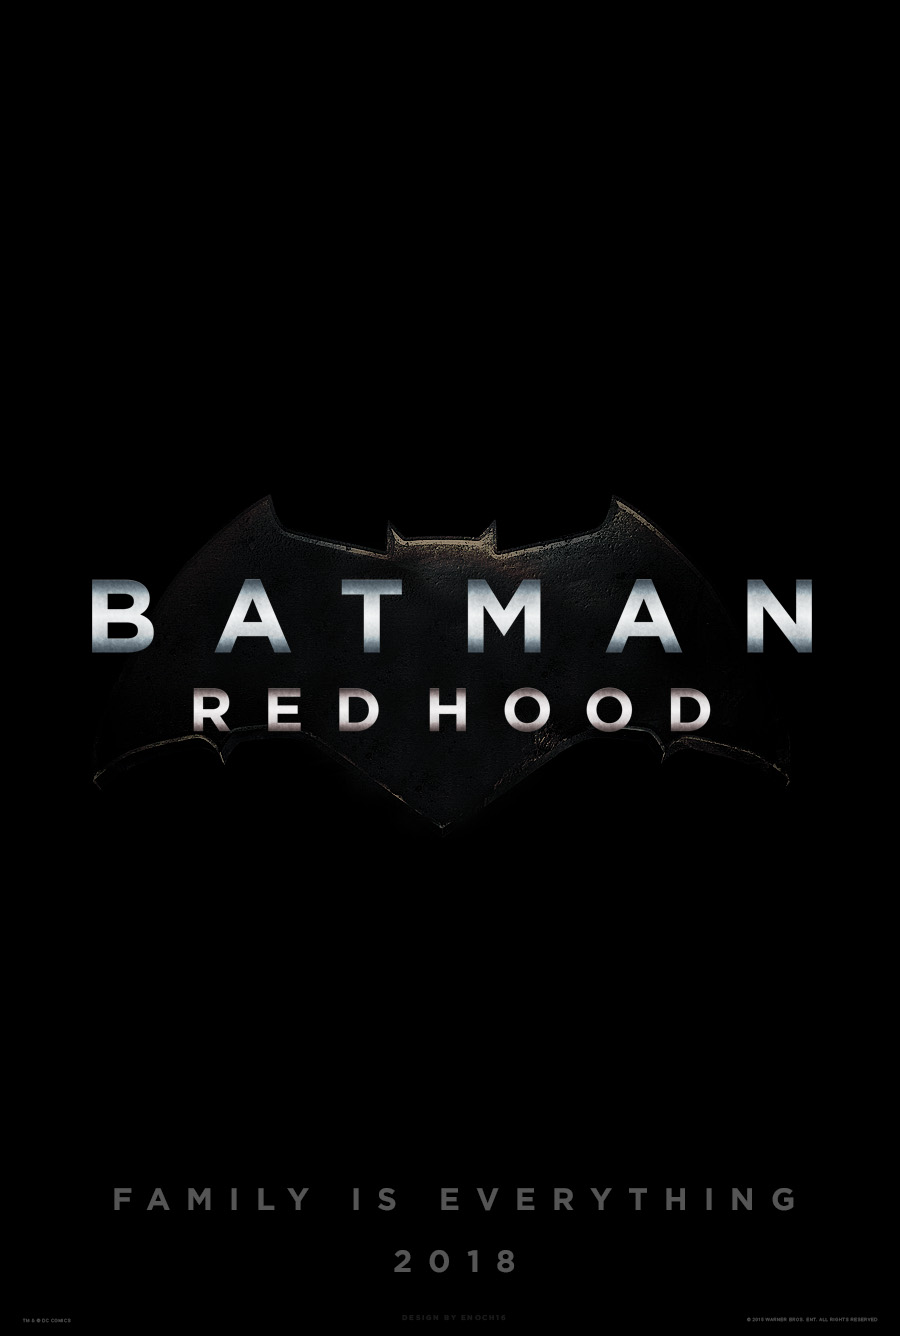 Batman: Red Hood Teaser Poster (2018) by Enoch16